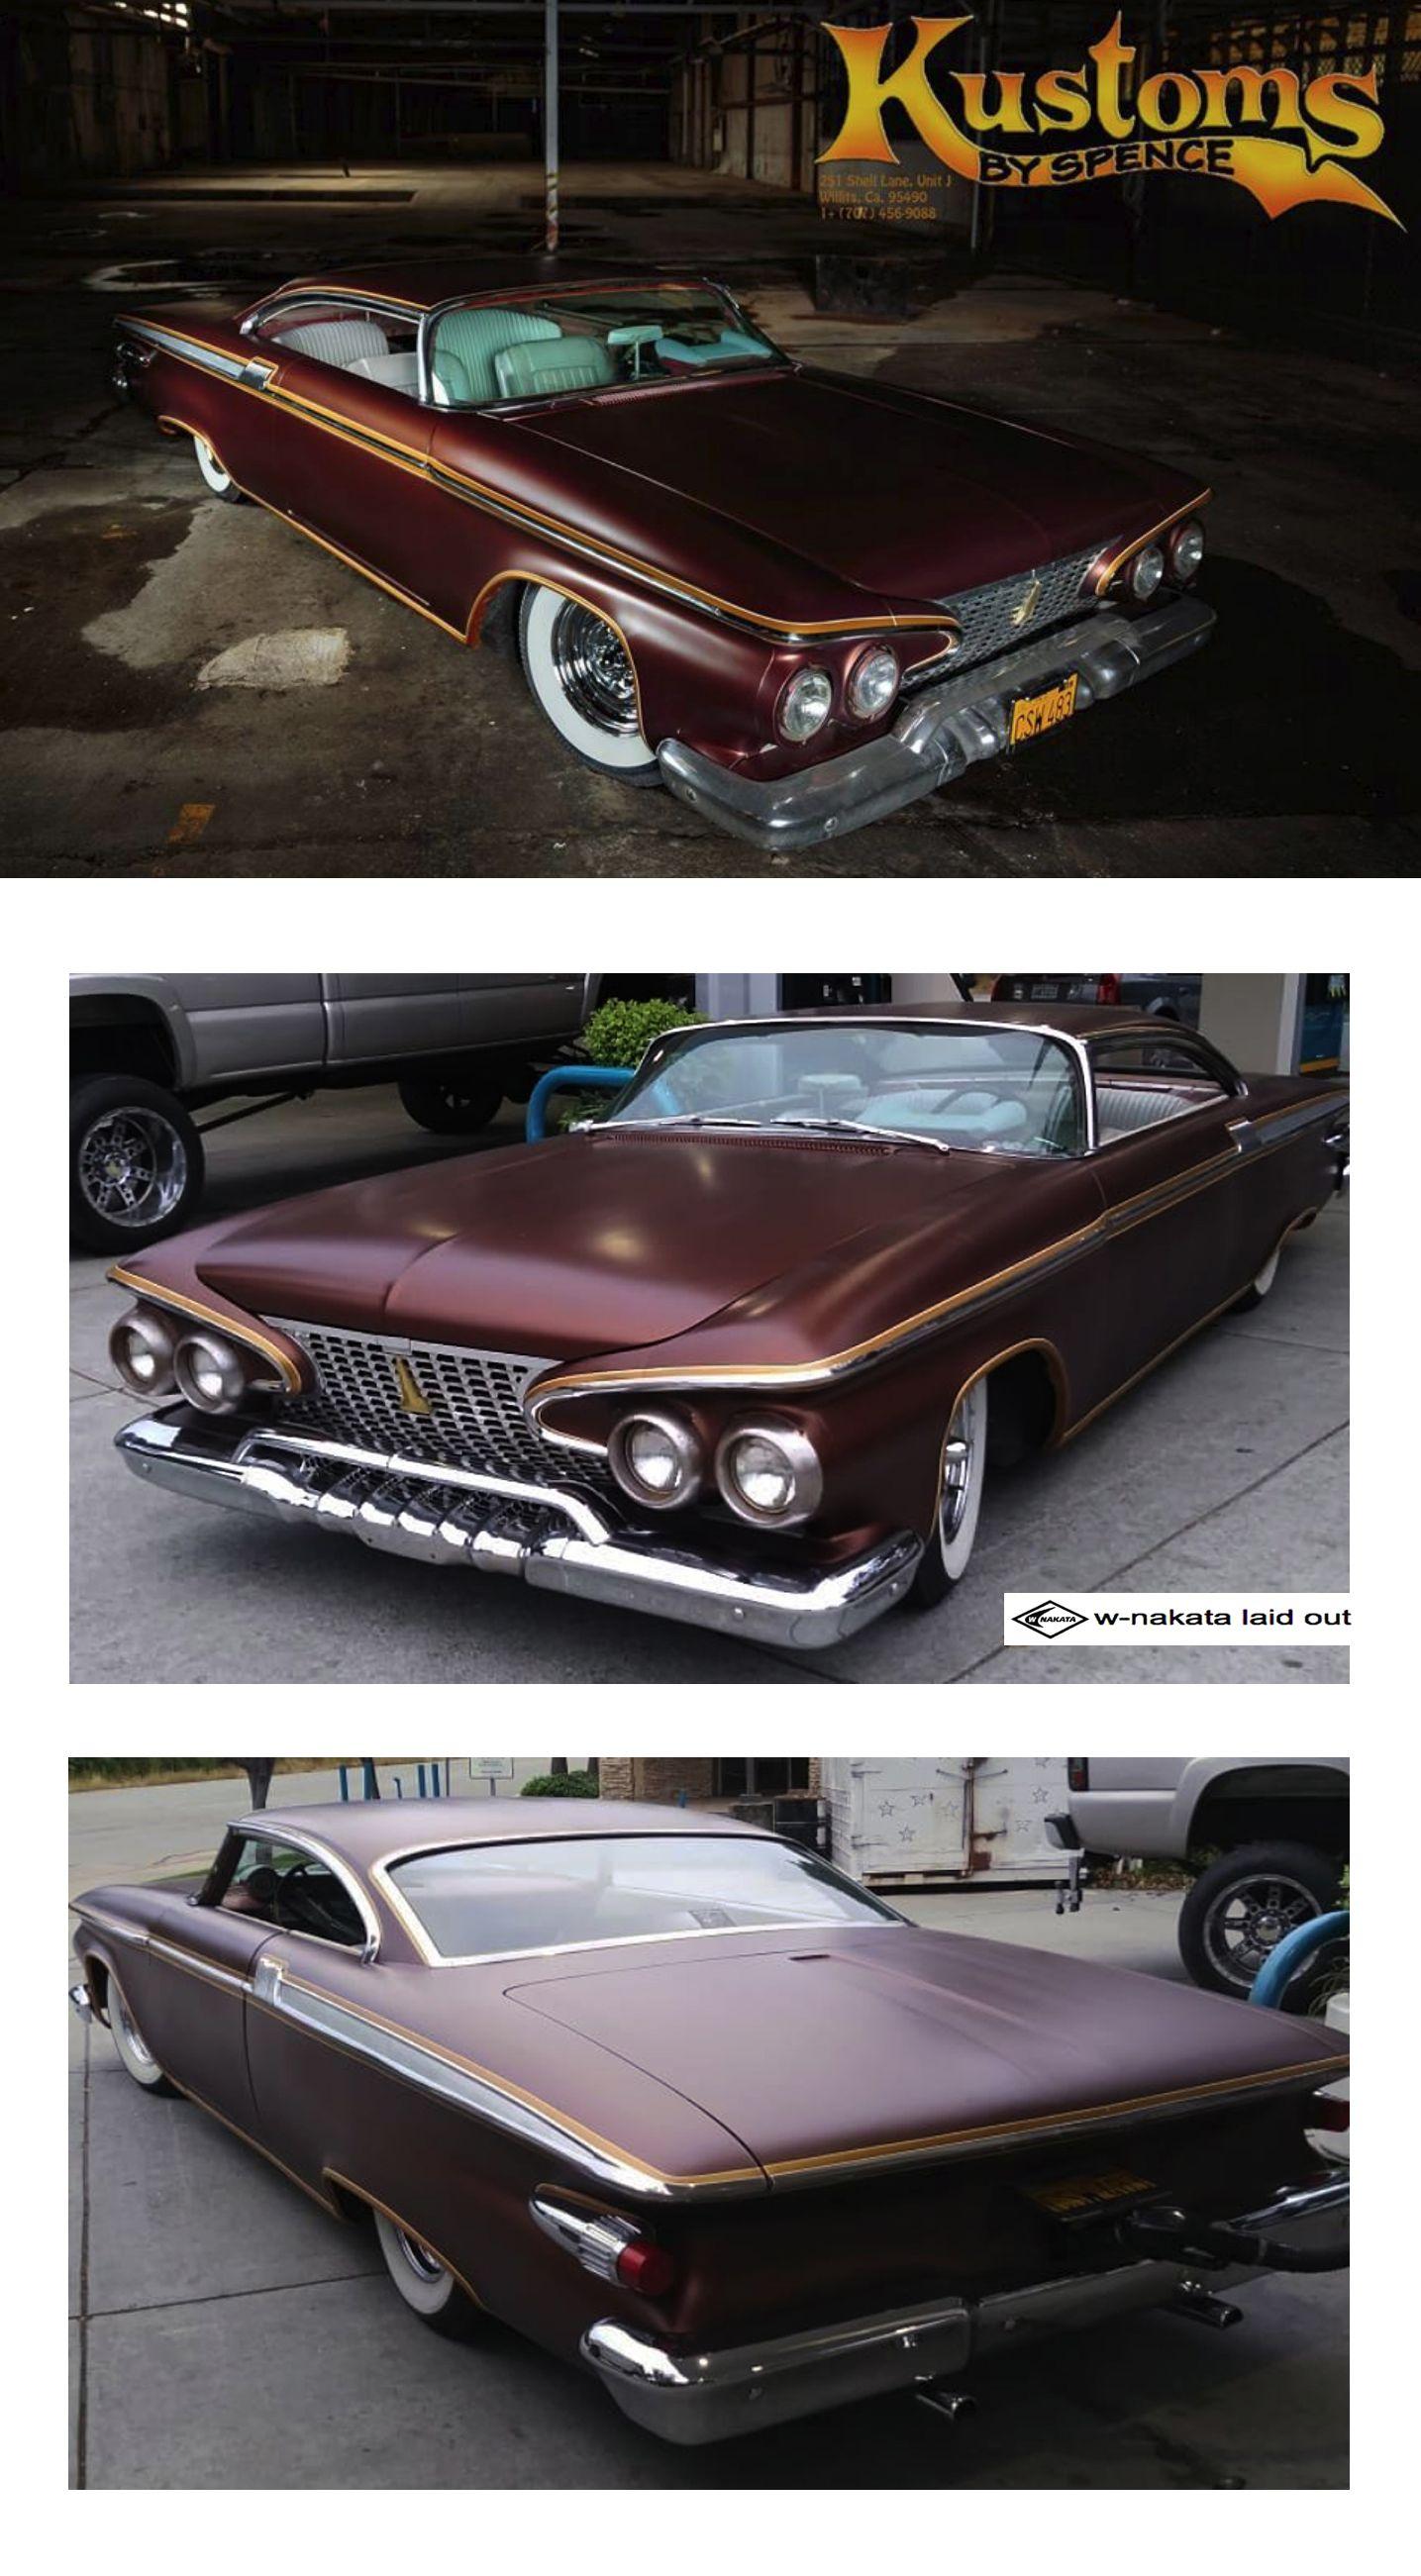 WNAKATA laid out///'61 Custom cars, Kustom, Vehicles